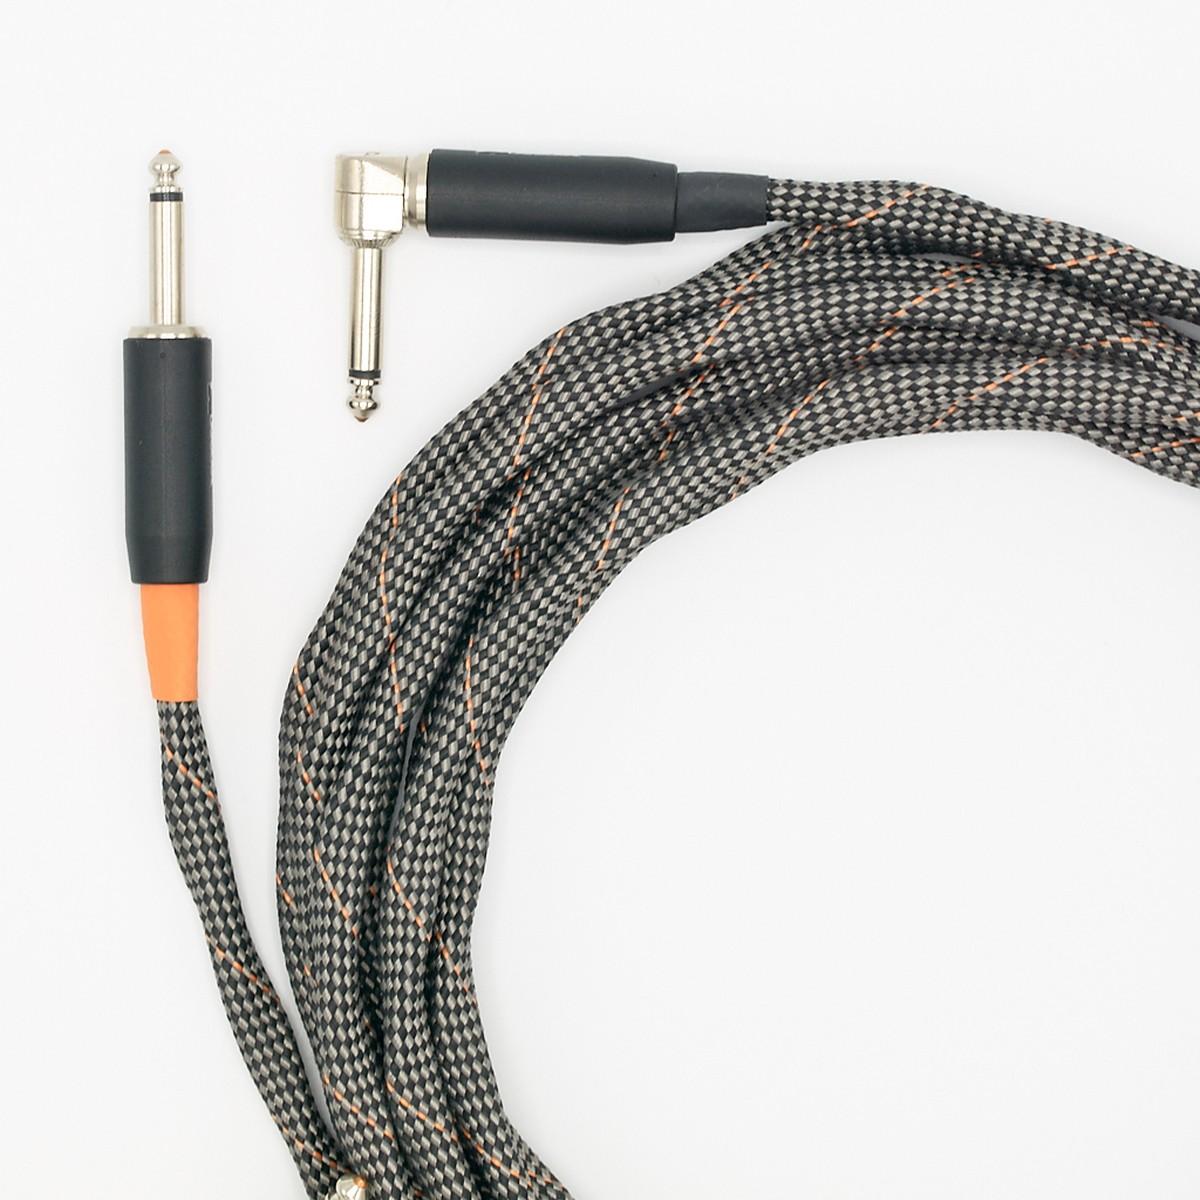 Vovox sonorus protect A Jack 90       Jack 6m